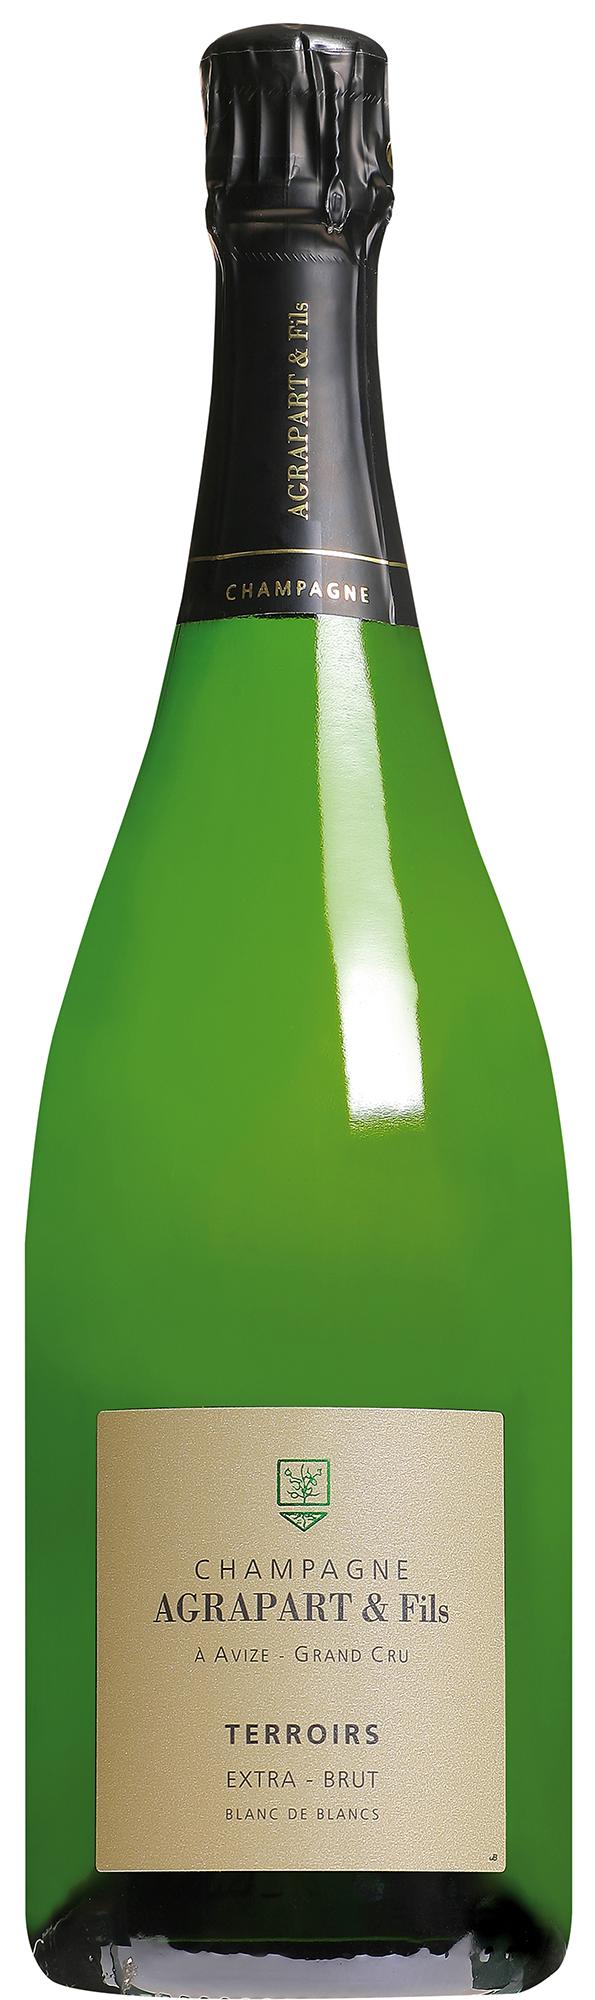 Agrapart Champagne Grand Cru Terroirs Extra Brut jéroboam